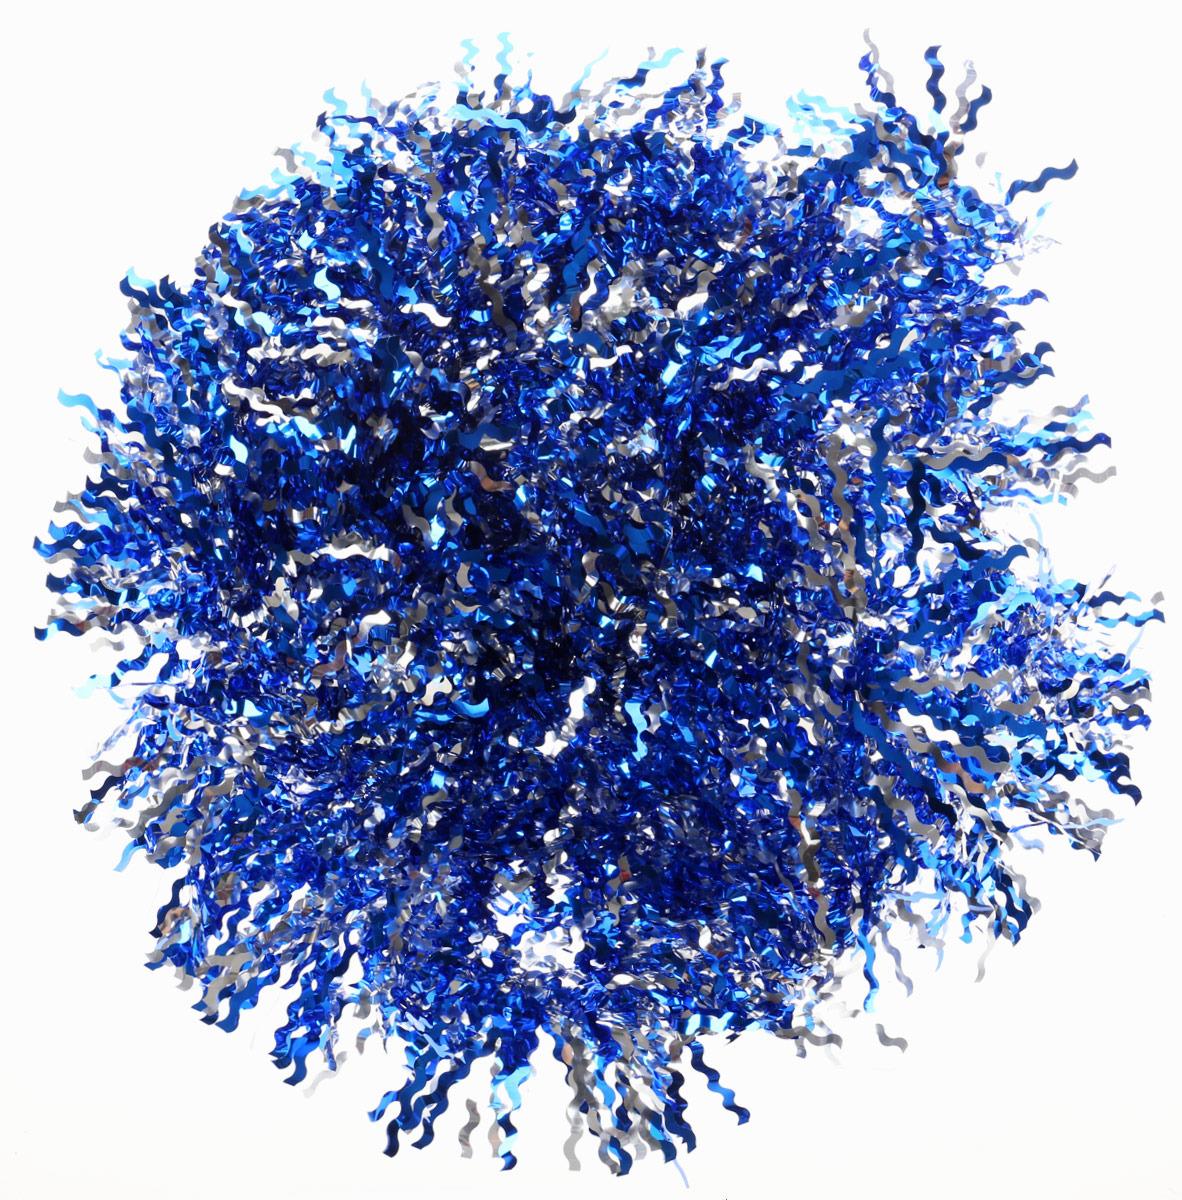 Мишура новогодняя Magic Time, цвет: синий микс, 9 х 200 см. 76722 цены онлайн